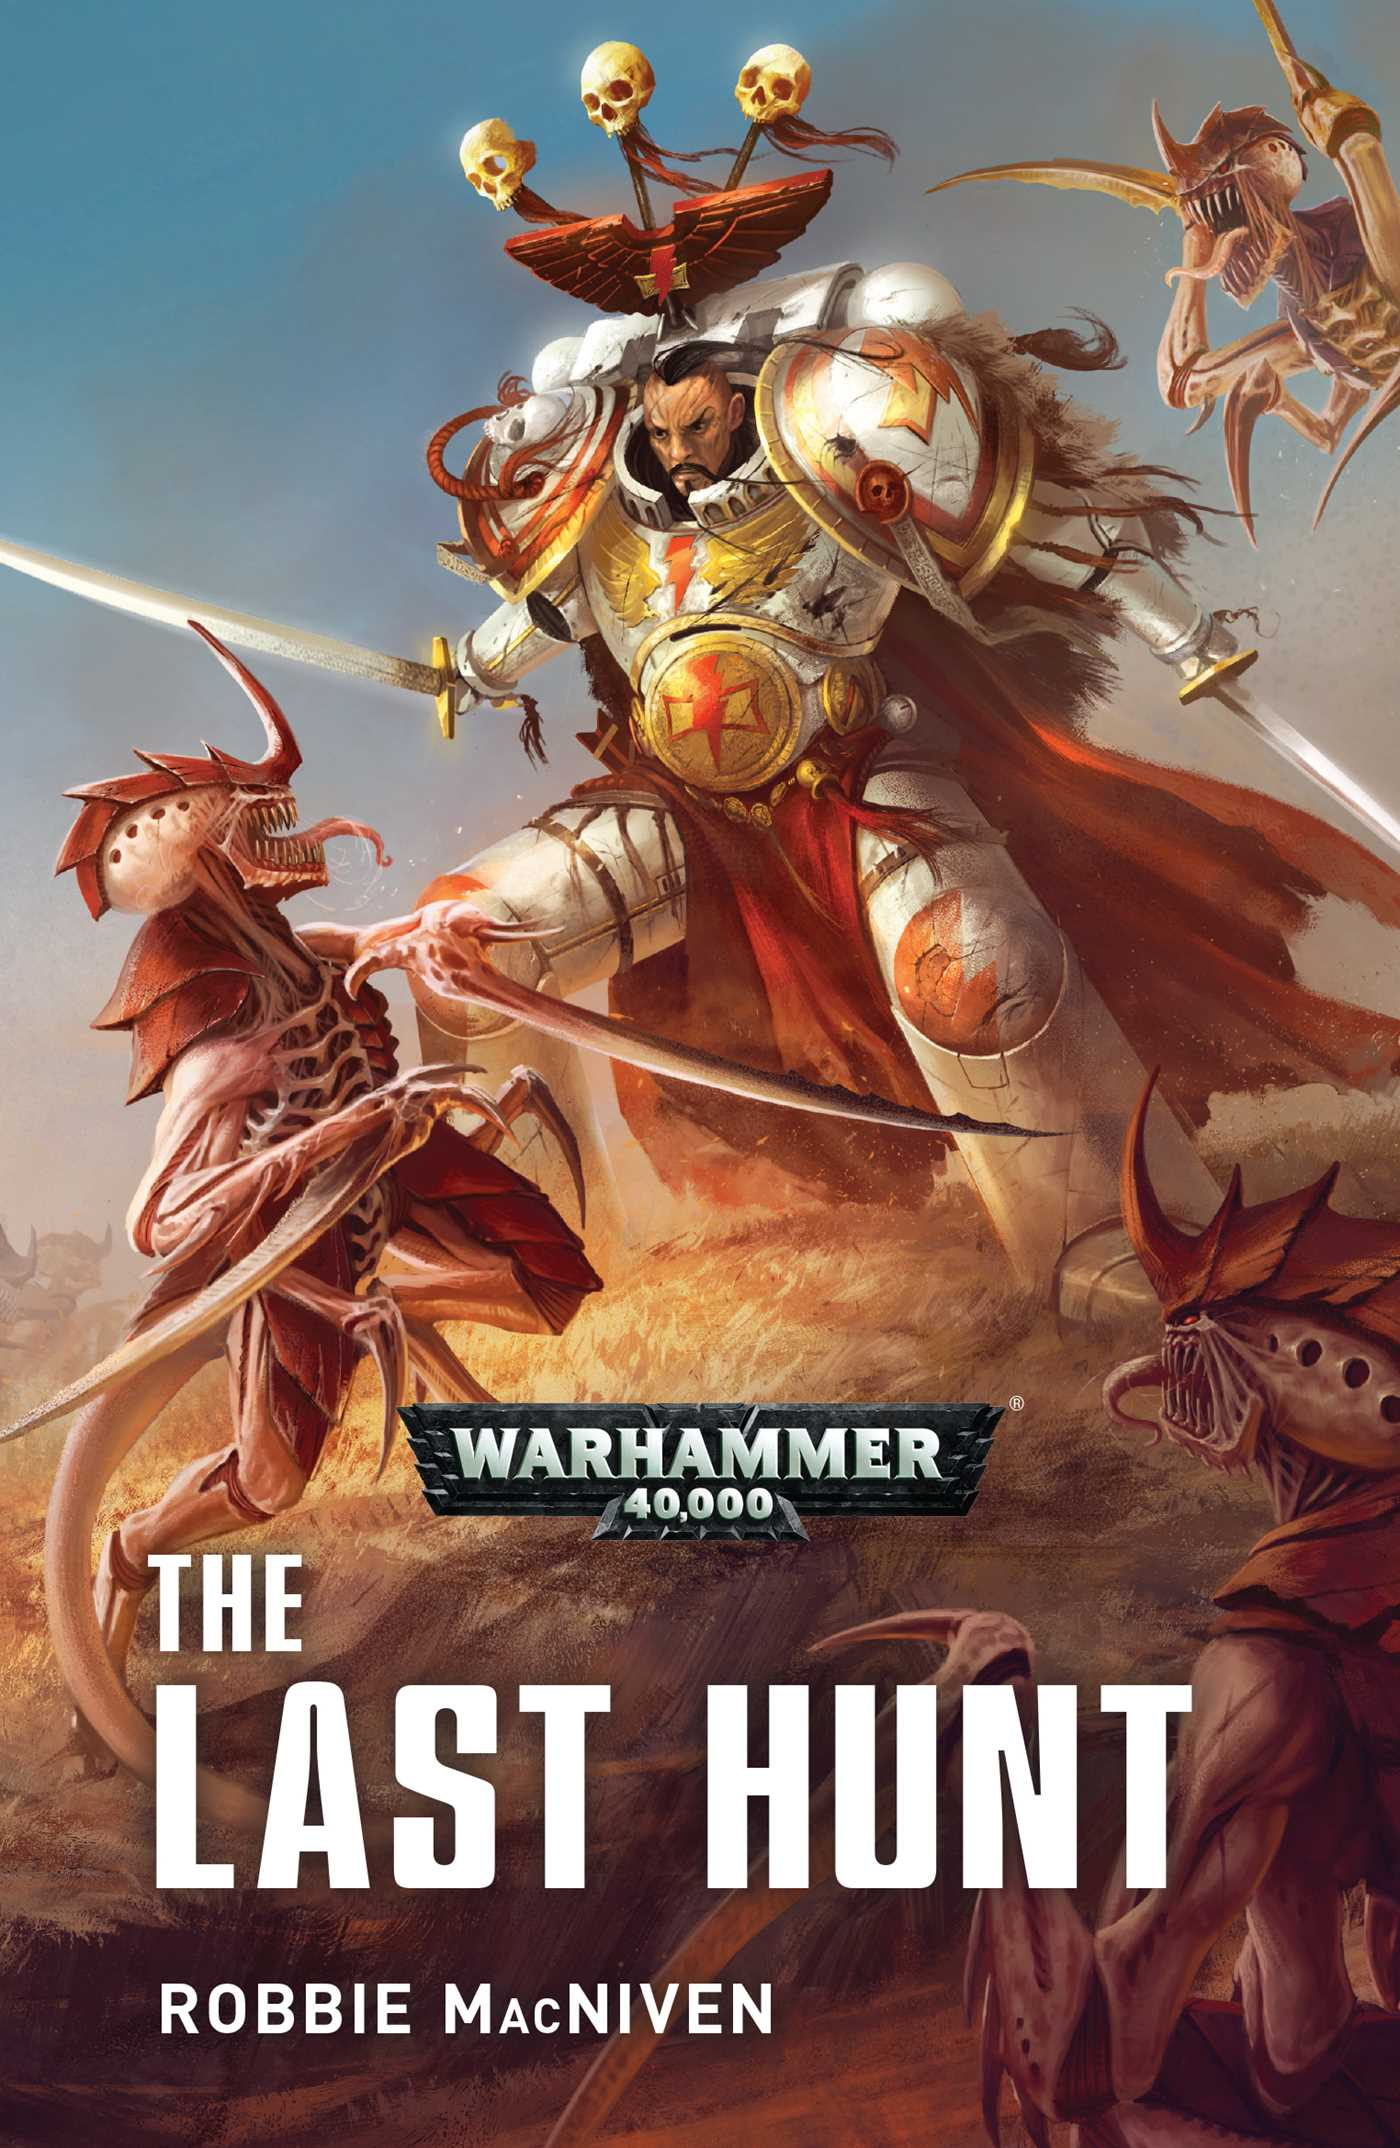 The last hunt 9781784966928 hr